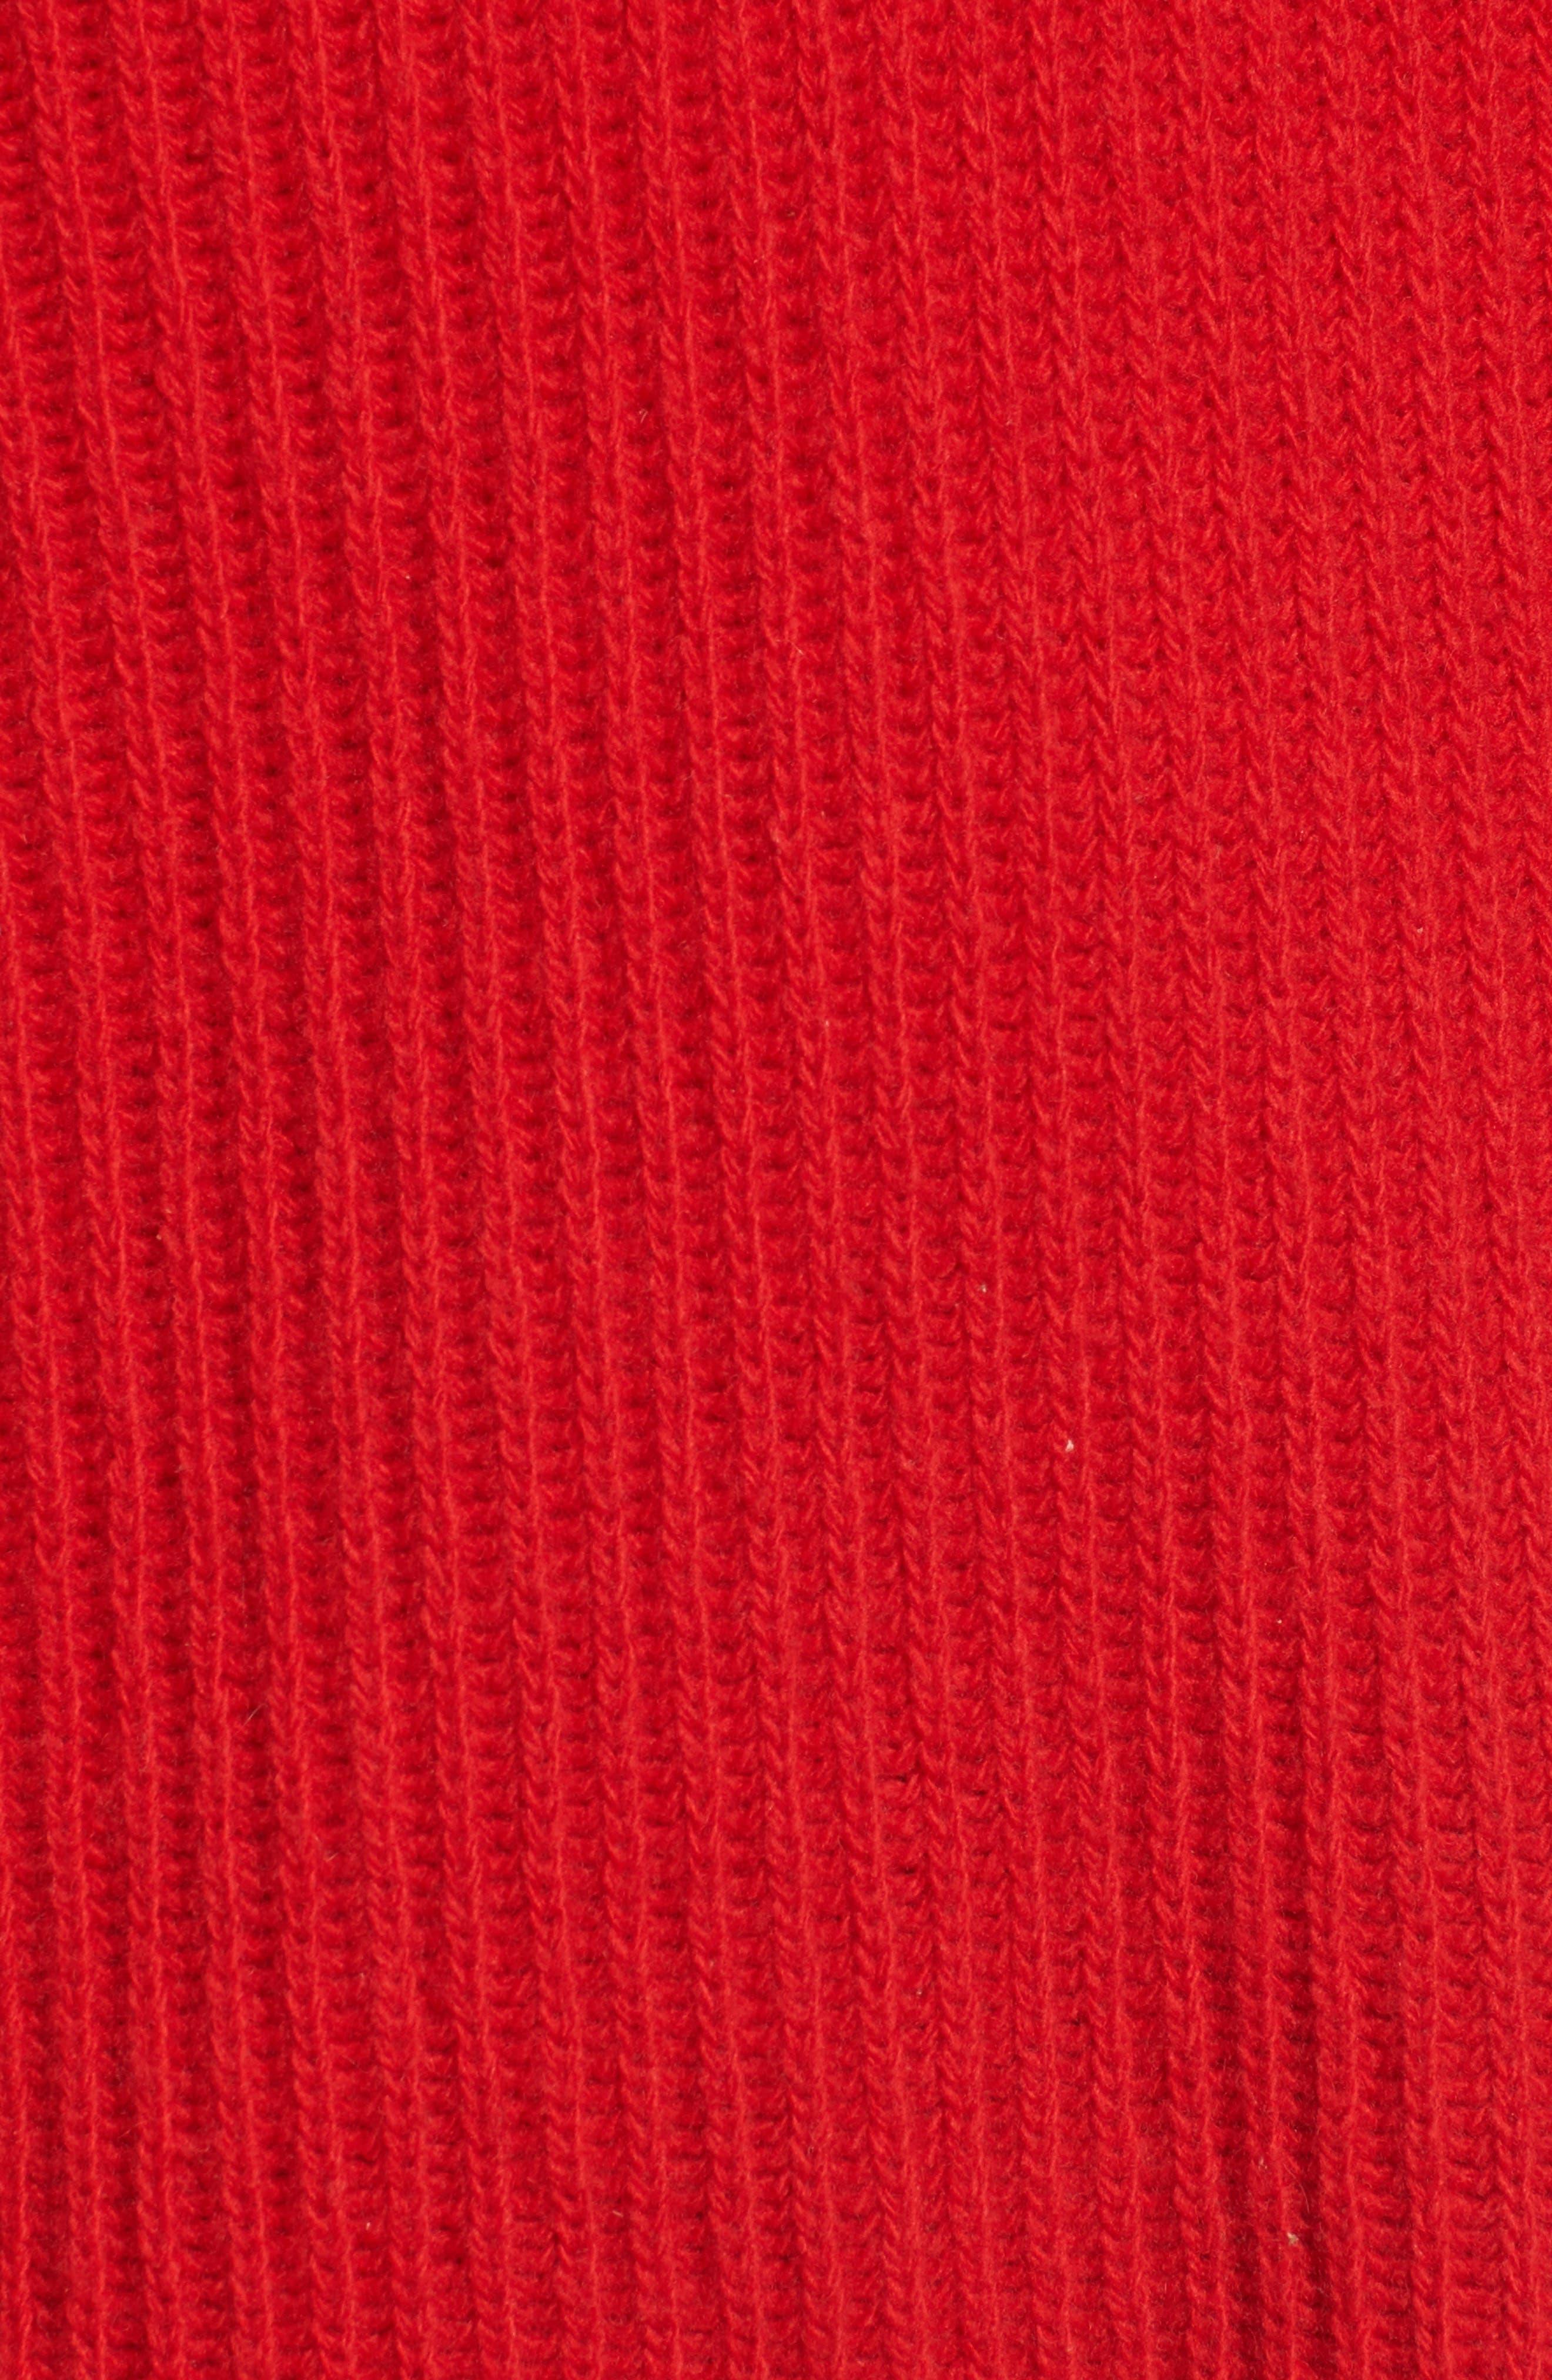 Kassy Wool Blend Sweater,                             Alternate thumbnail 5, color,                             600